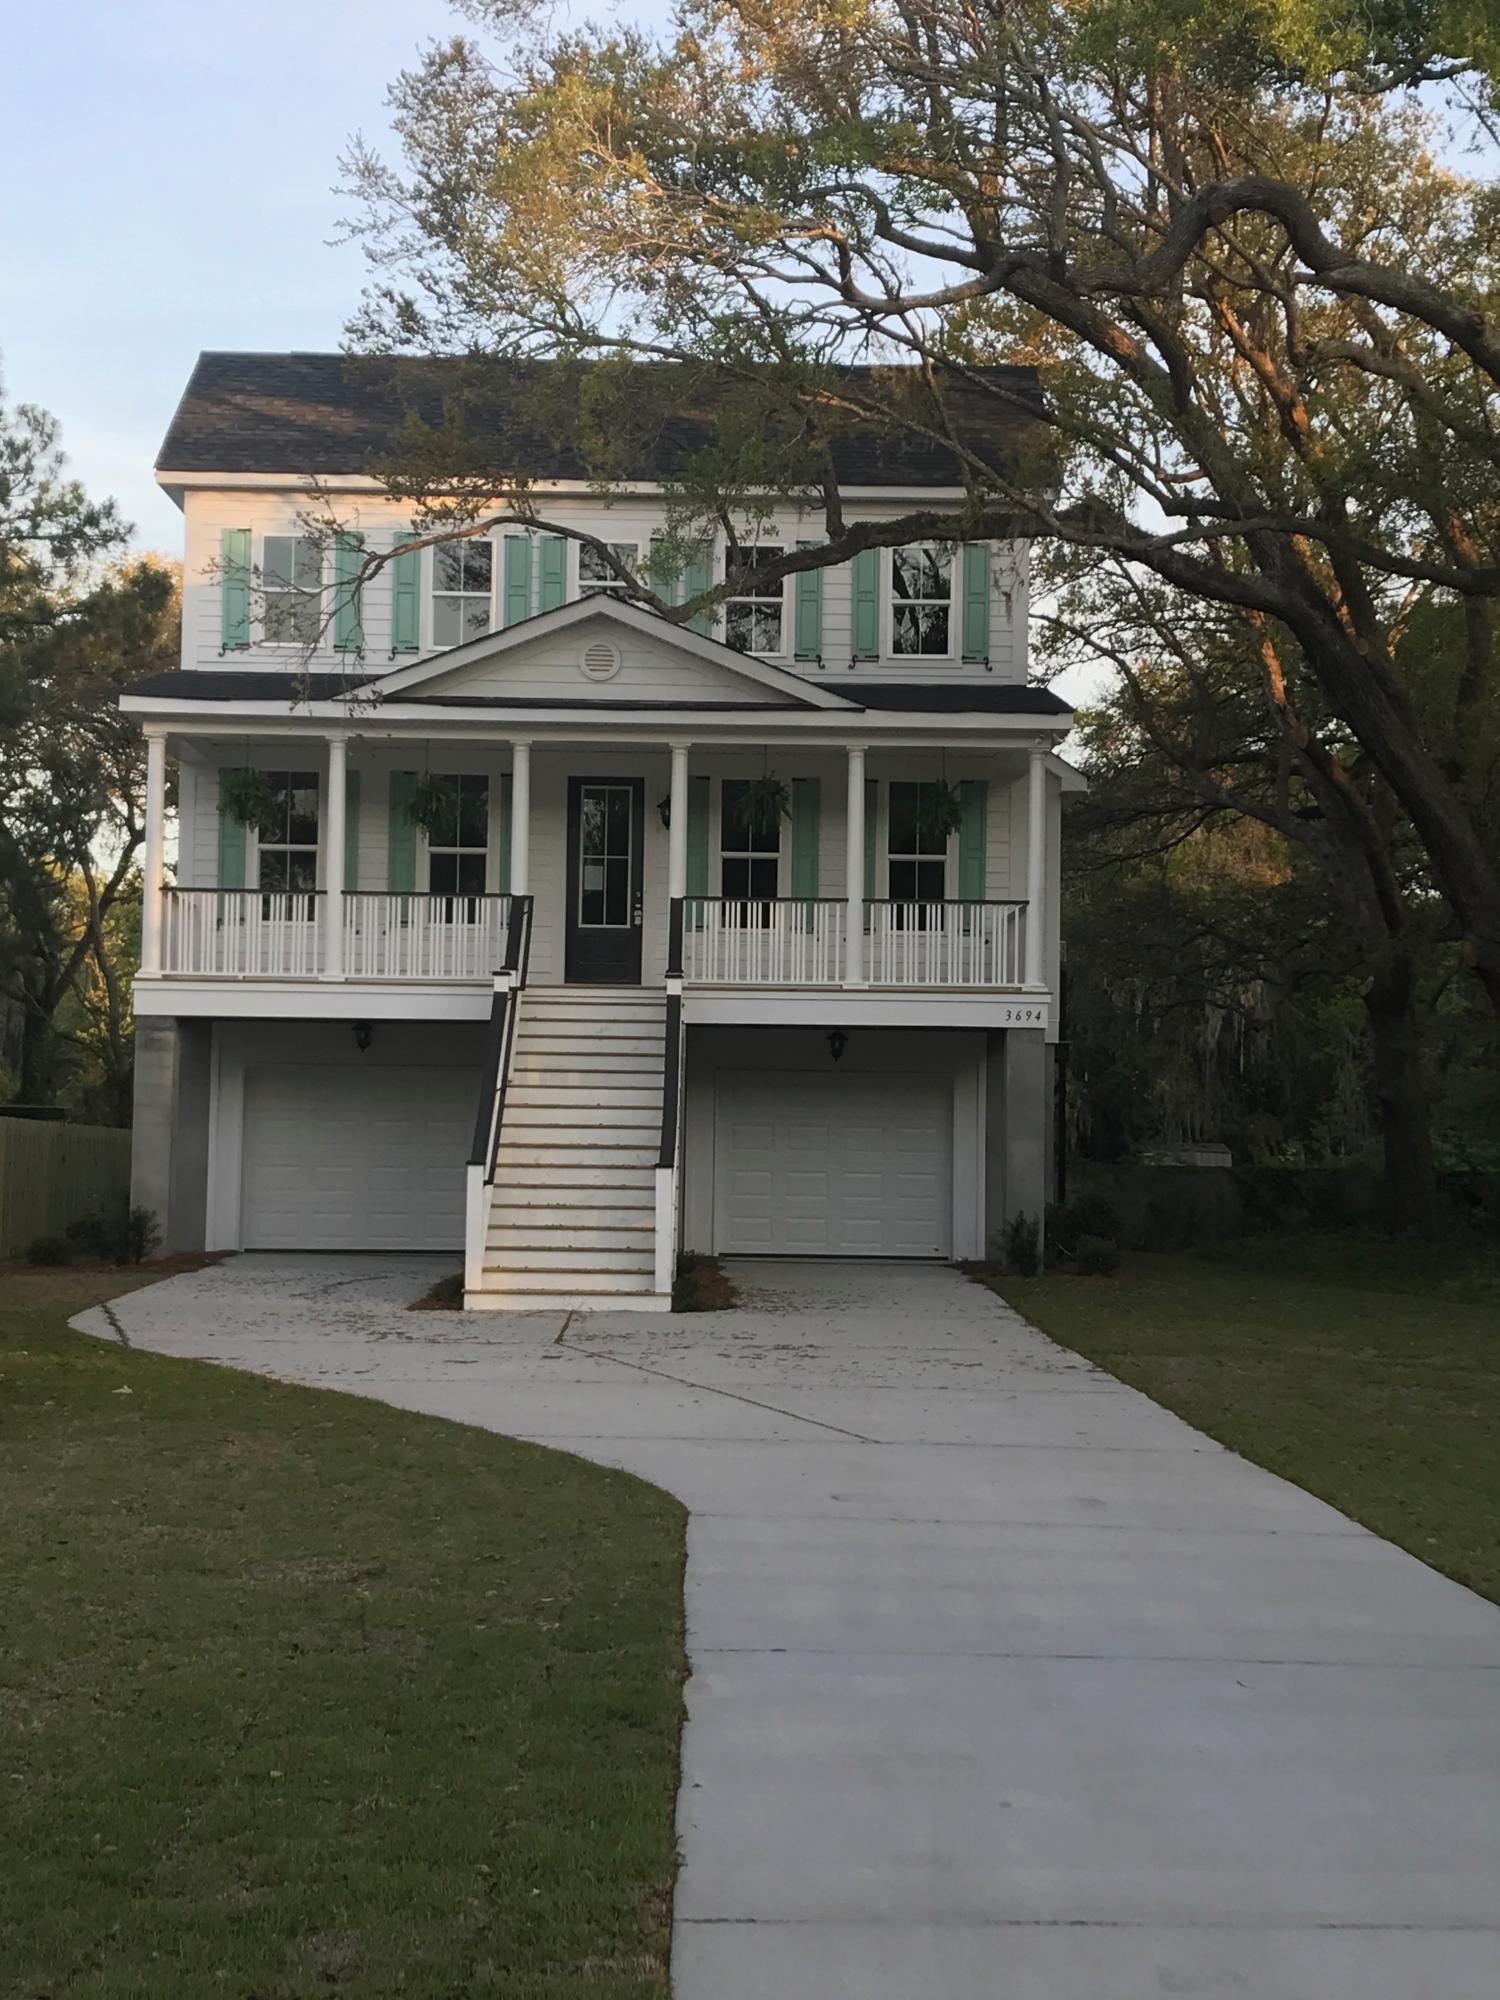 Home for sale 3694 Tip Lane , Copahee View, Mt. Pleasant, SC